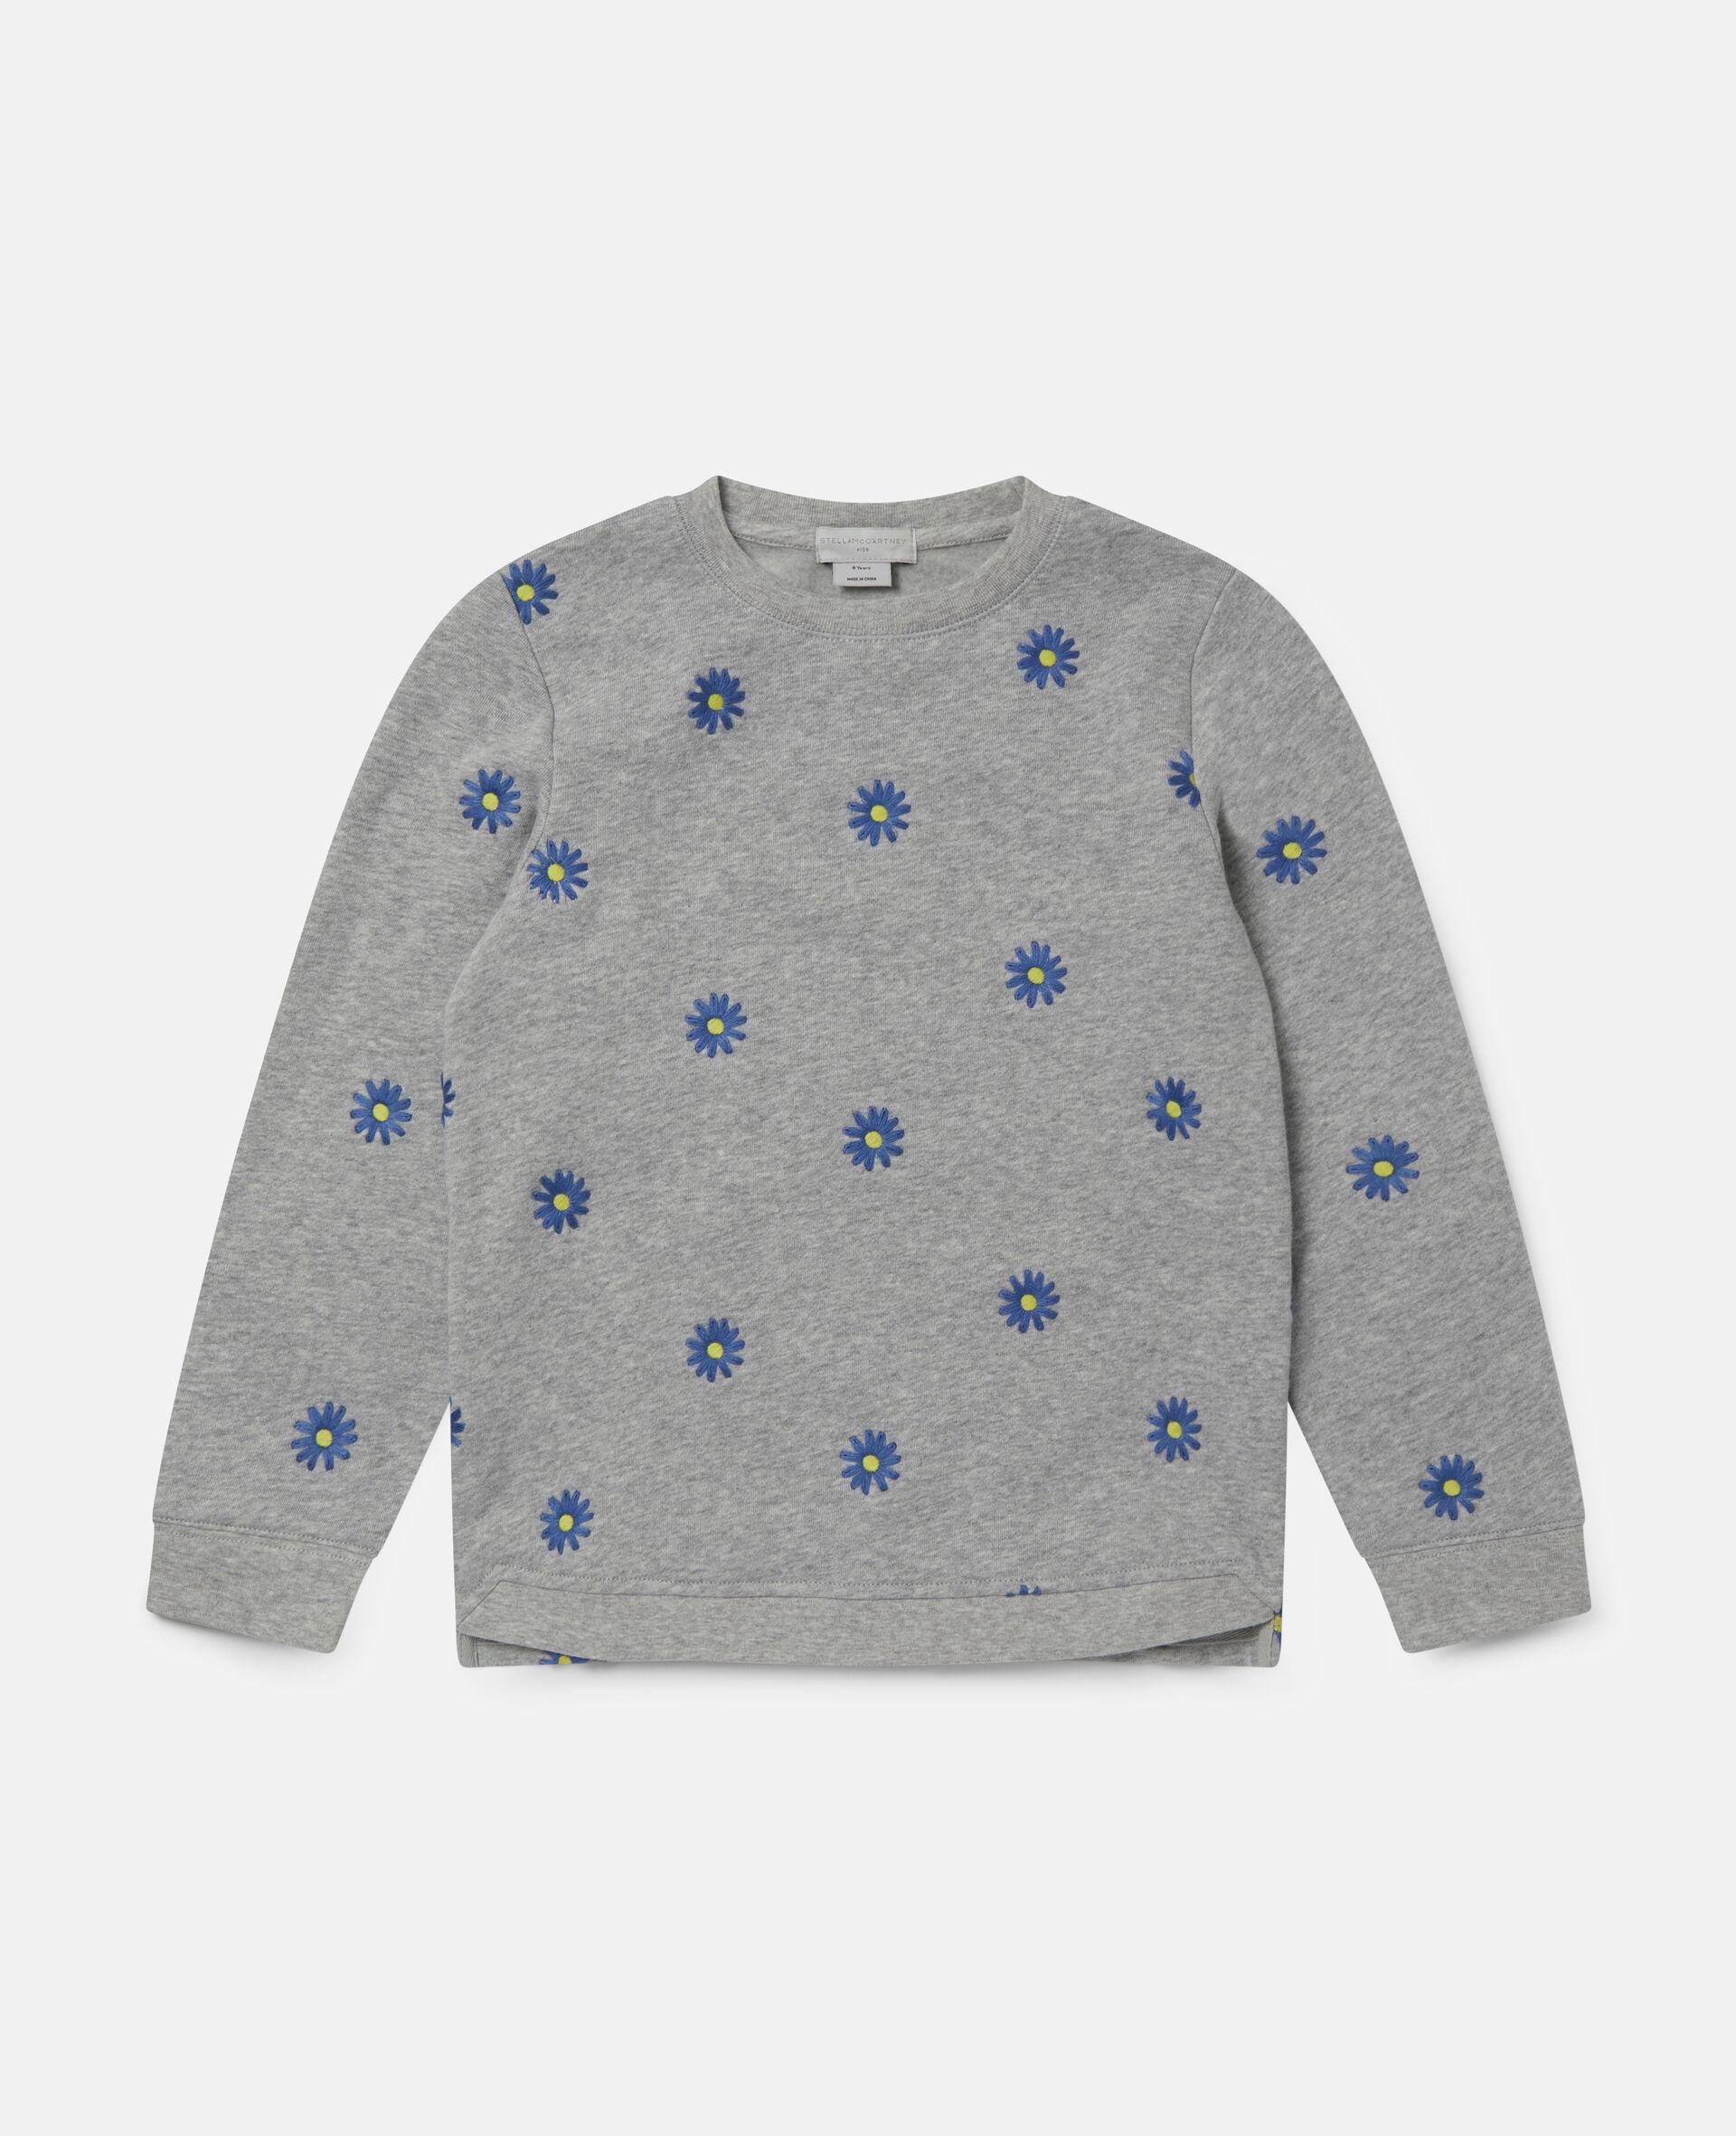 Baumwollfleece-Sweatshirt mit Gänseblümchenmotiv -Grau-large image number 0